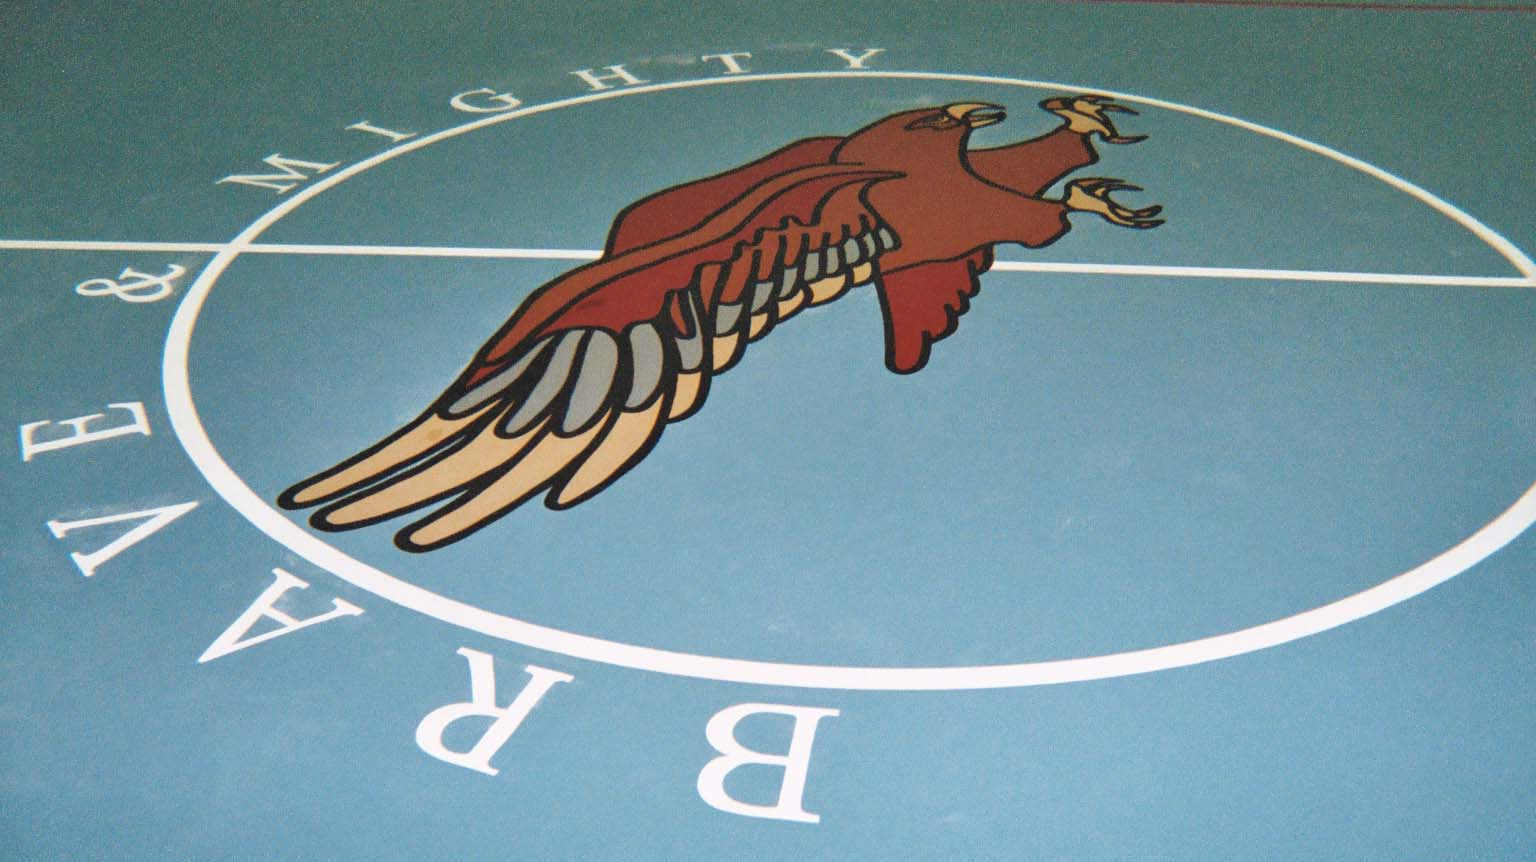 El Cerrito Middle School in Corona CA - hand painted graphics on epoxy floor